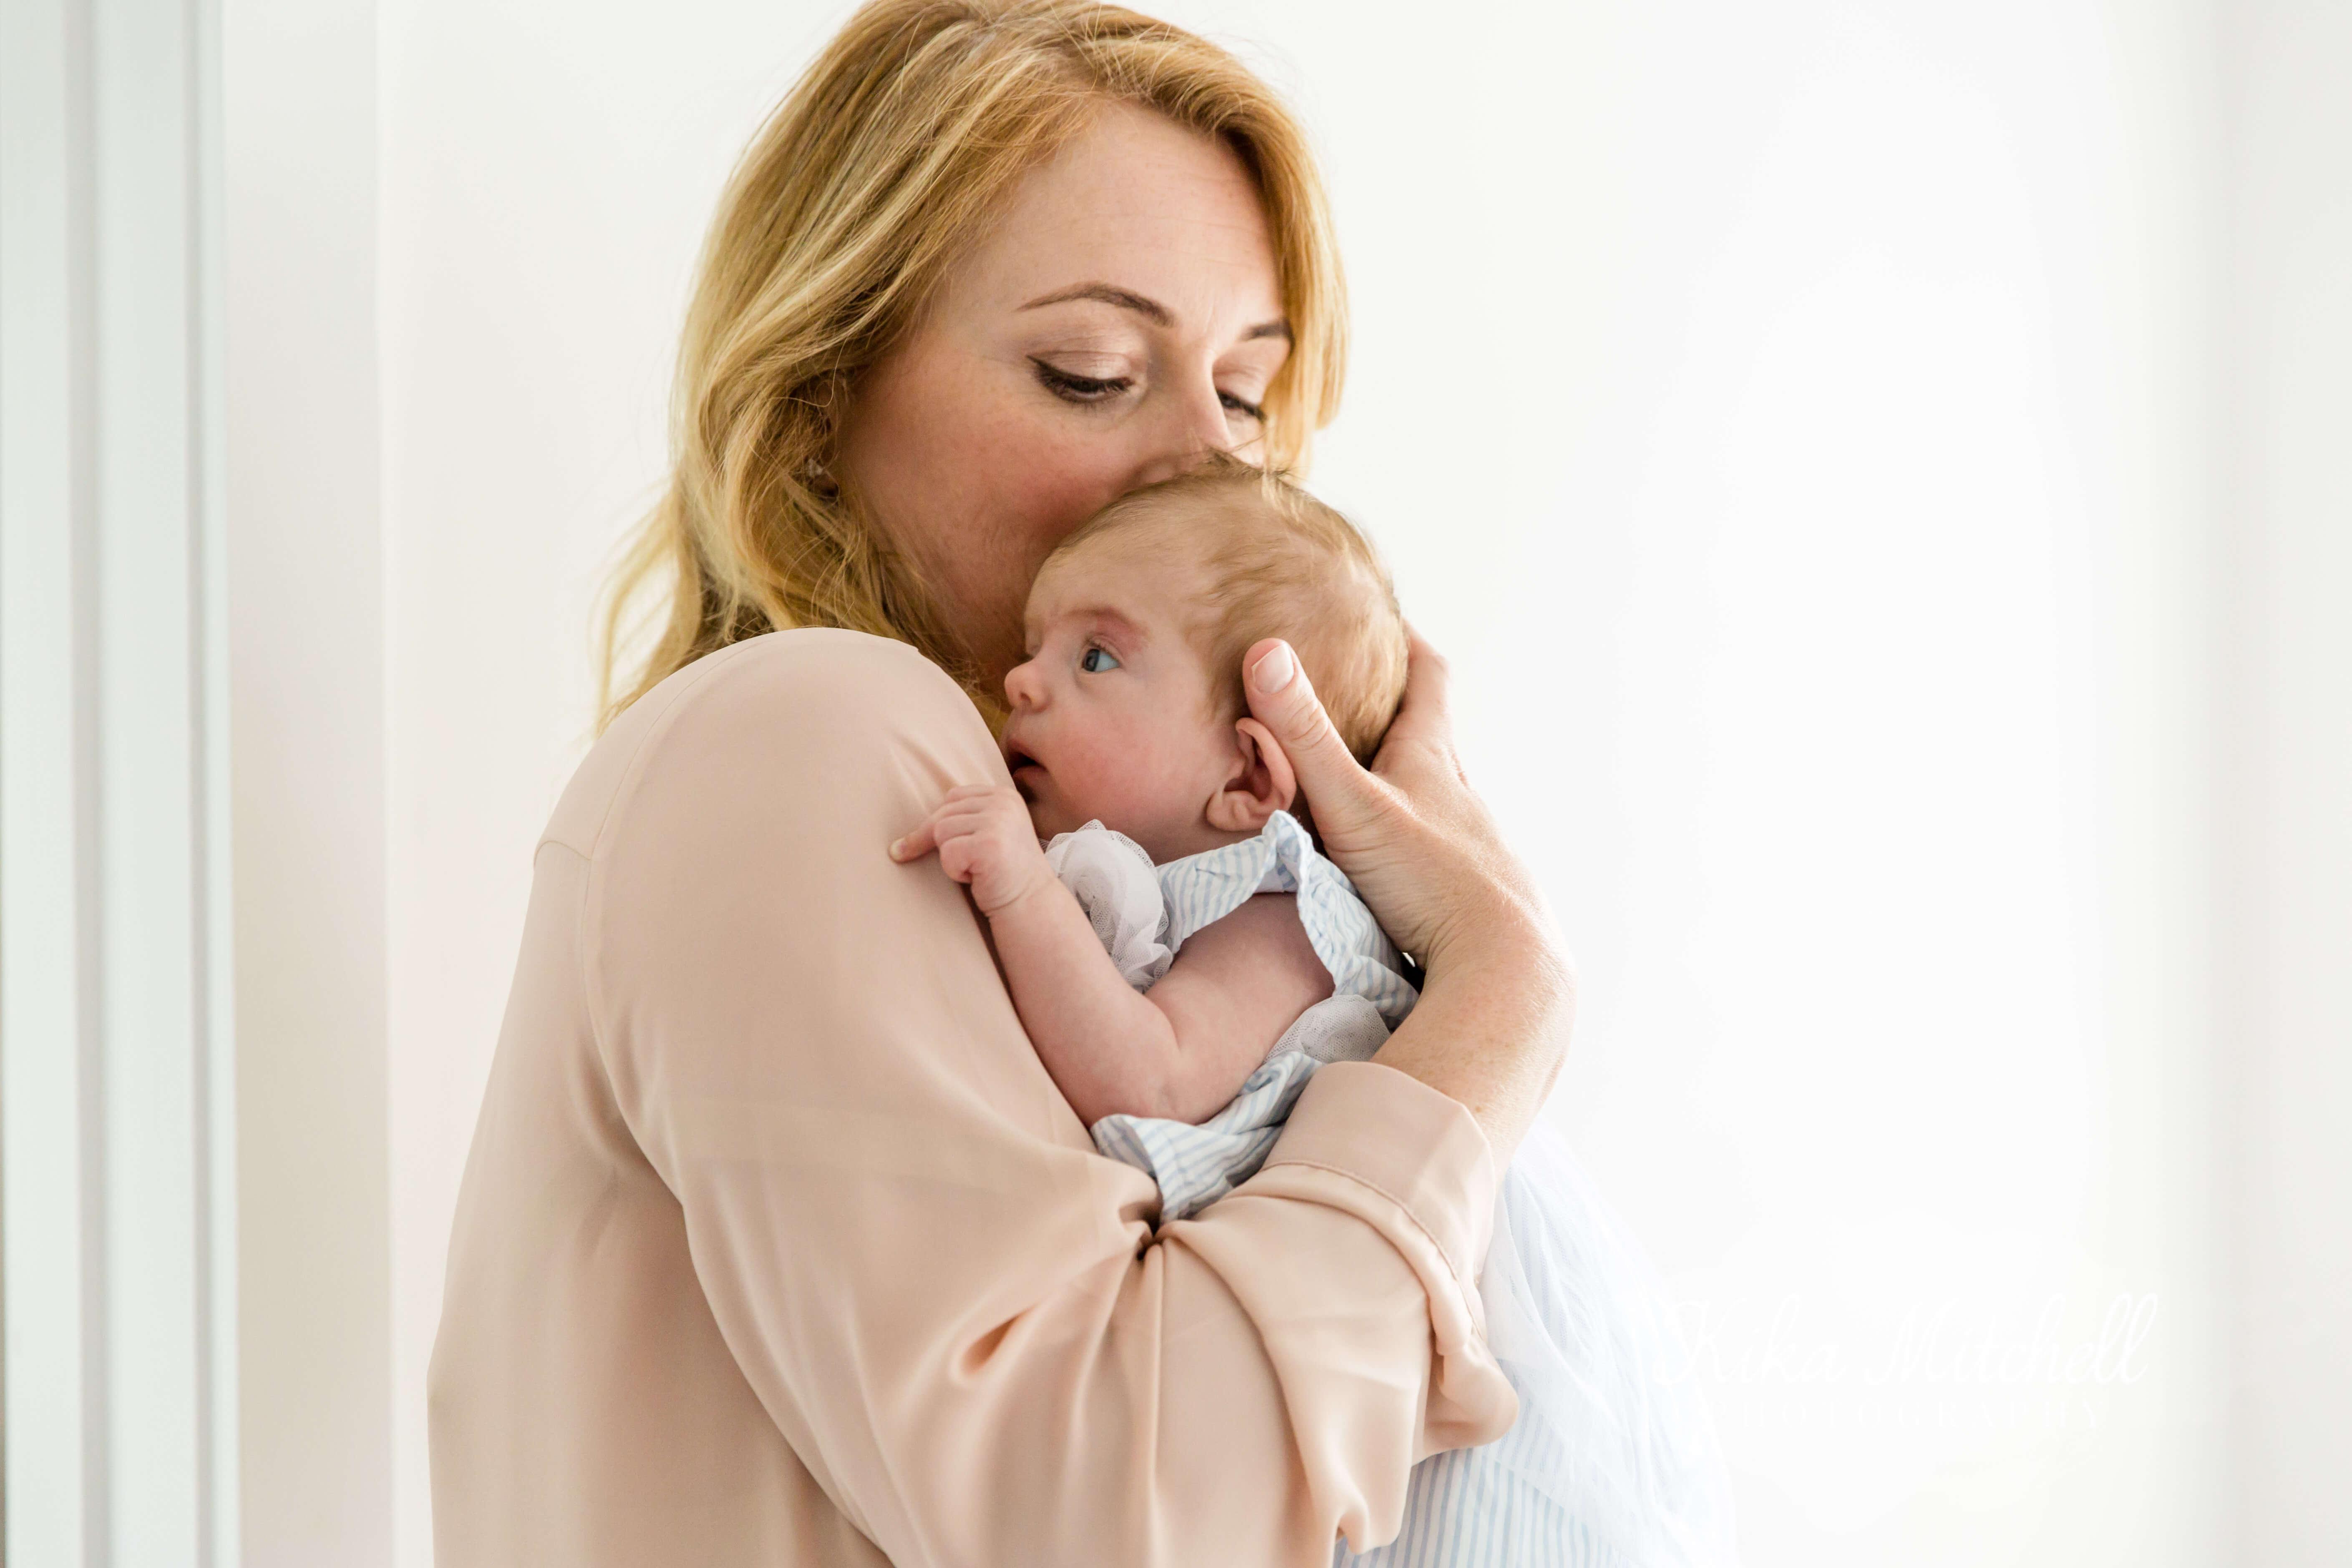 Natural newborn lifestyle photoshoots by Kika Mitchell Photography Chelmsford Photographer